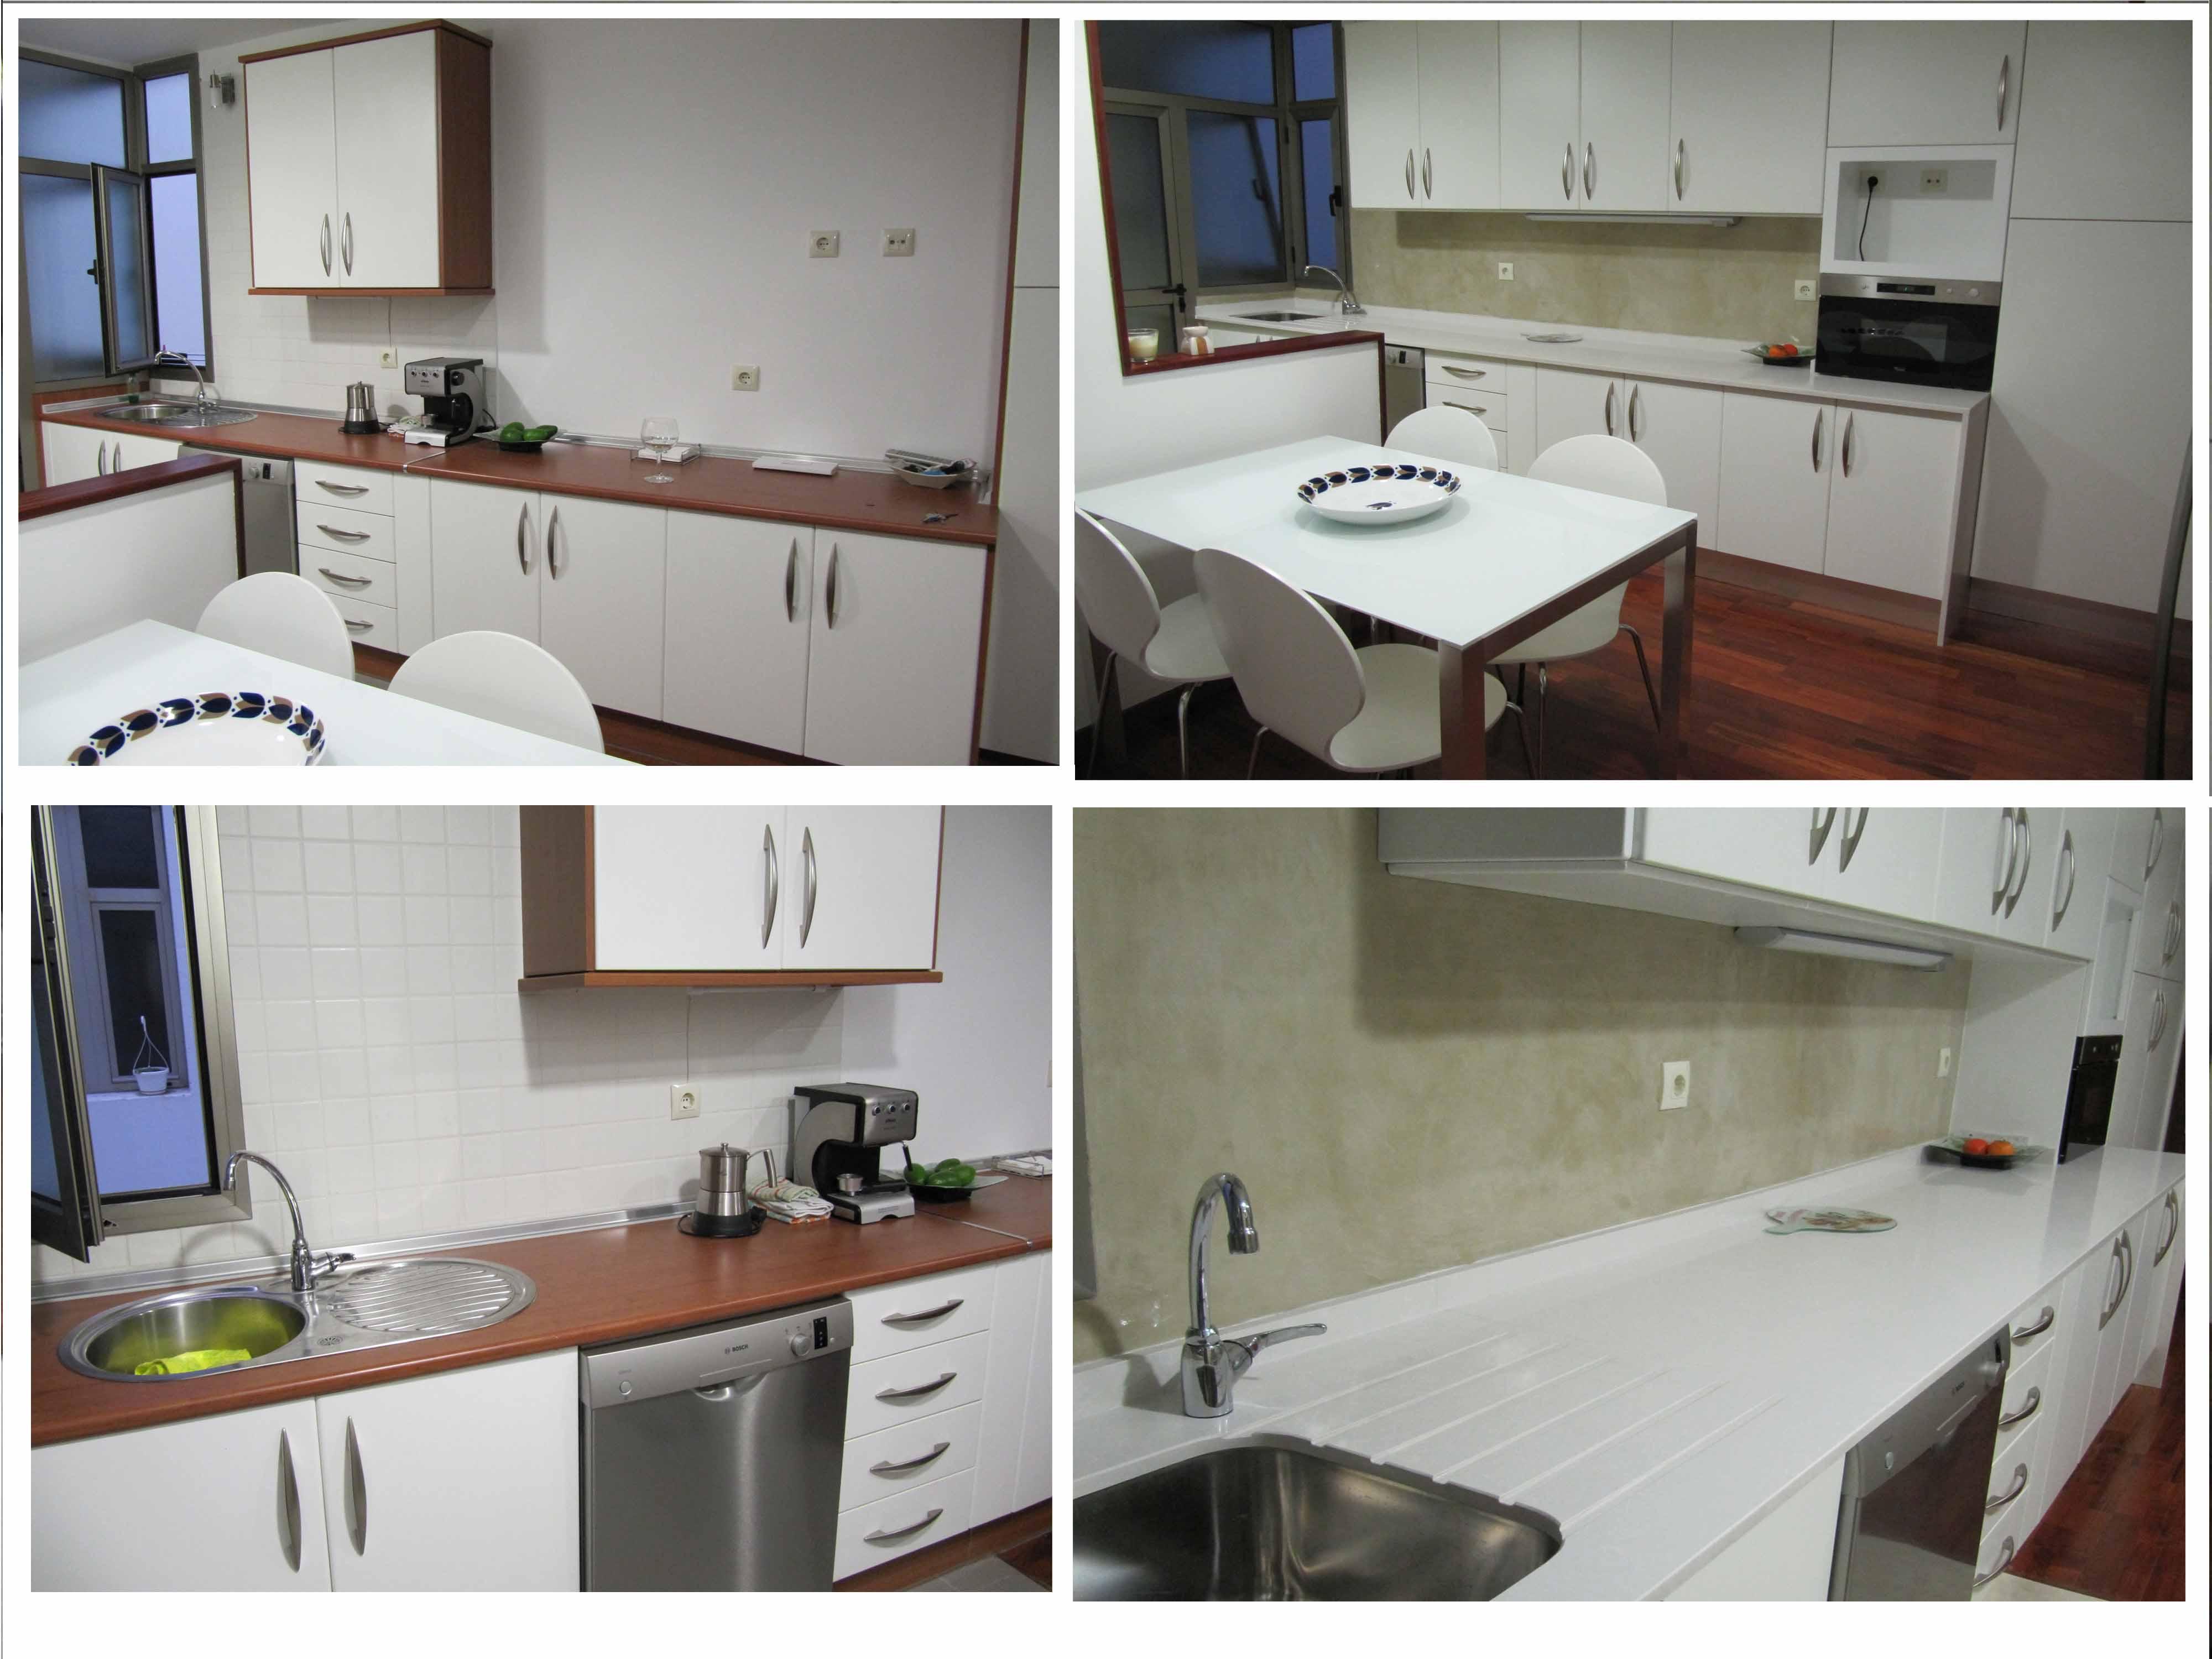 Reformar ba o sin quitar azulejos - Forrar azulejos cocina ...